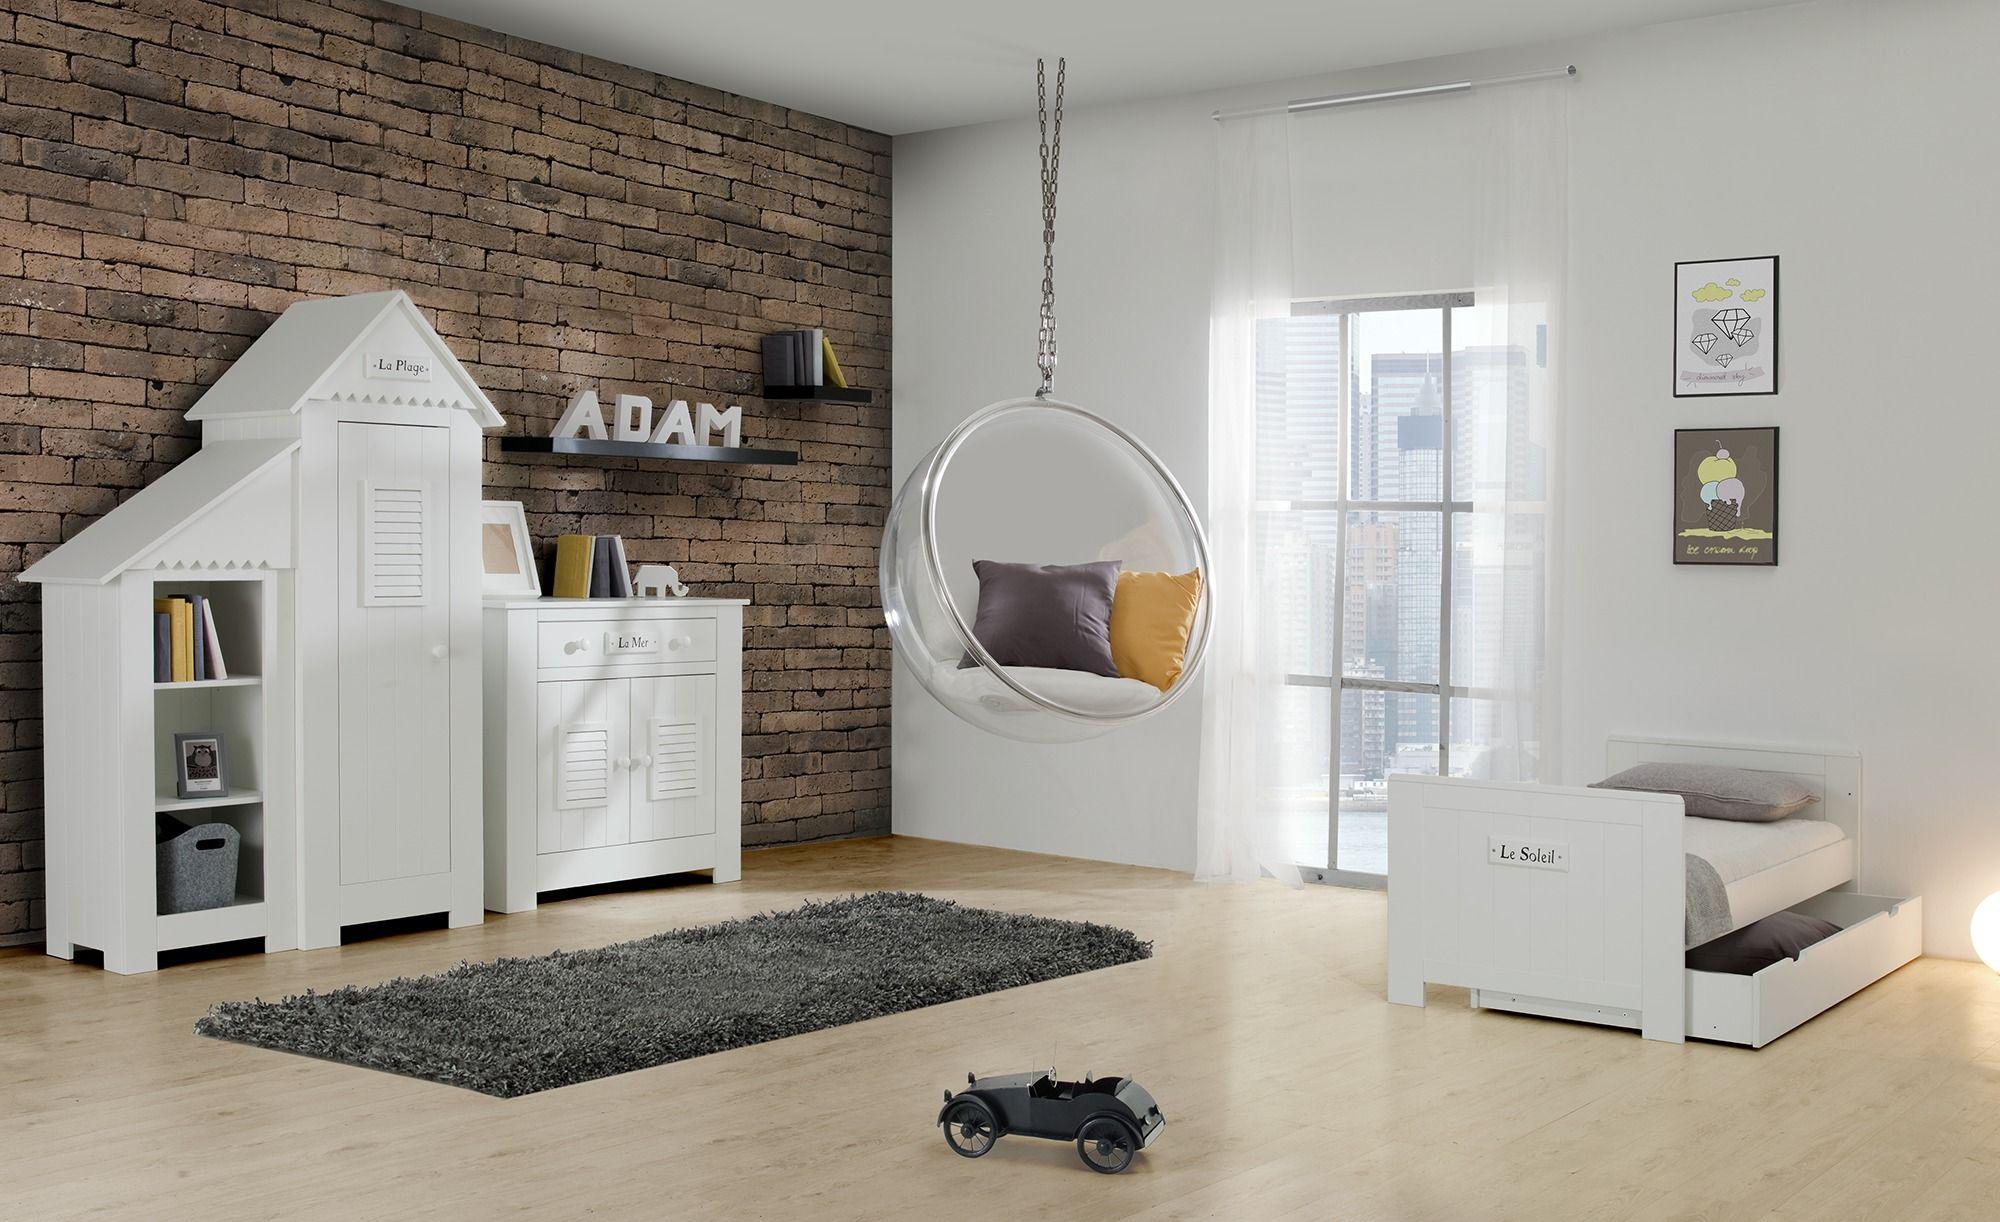 Kombi Kinderbett Mara Moderne Schlafzimmermobel Kinderbett Und Kinder Bett